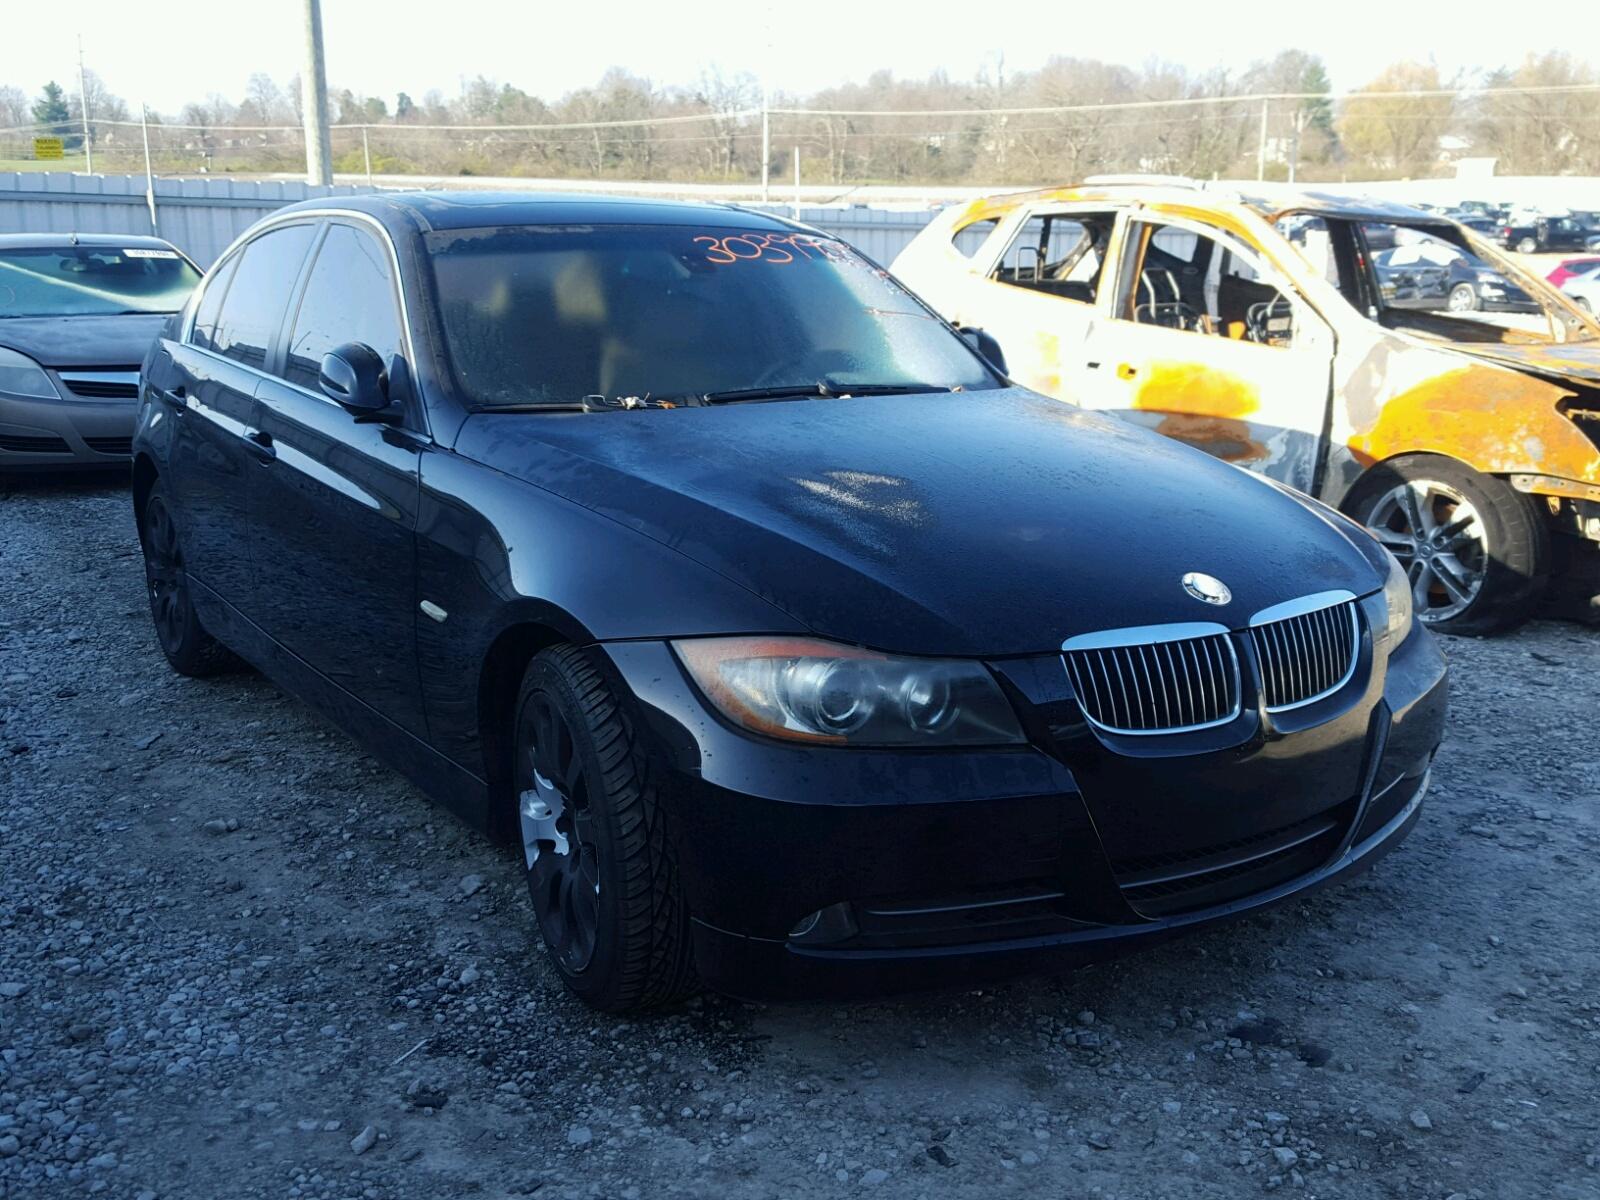 Wbavb13506kx33446 2006 Black Bmw 325i On Sale In Sc